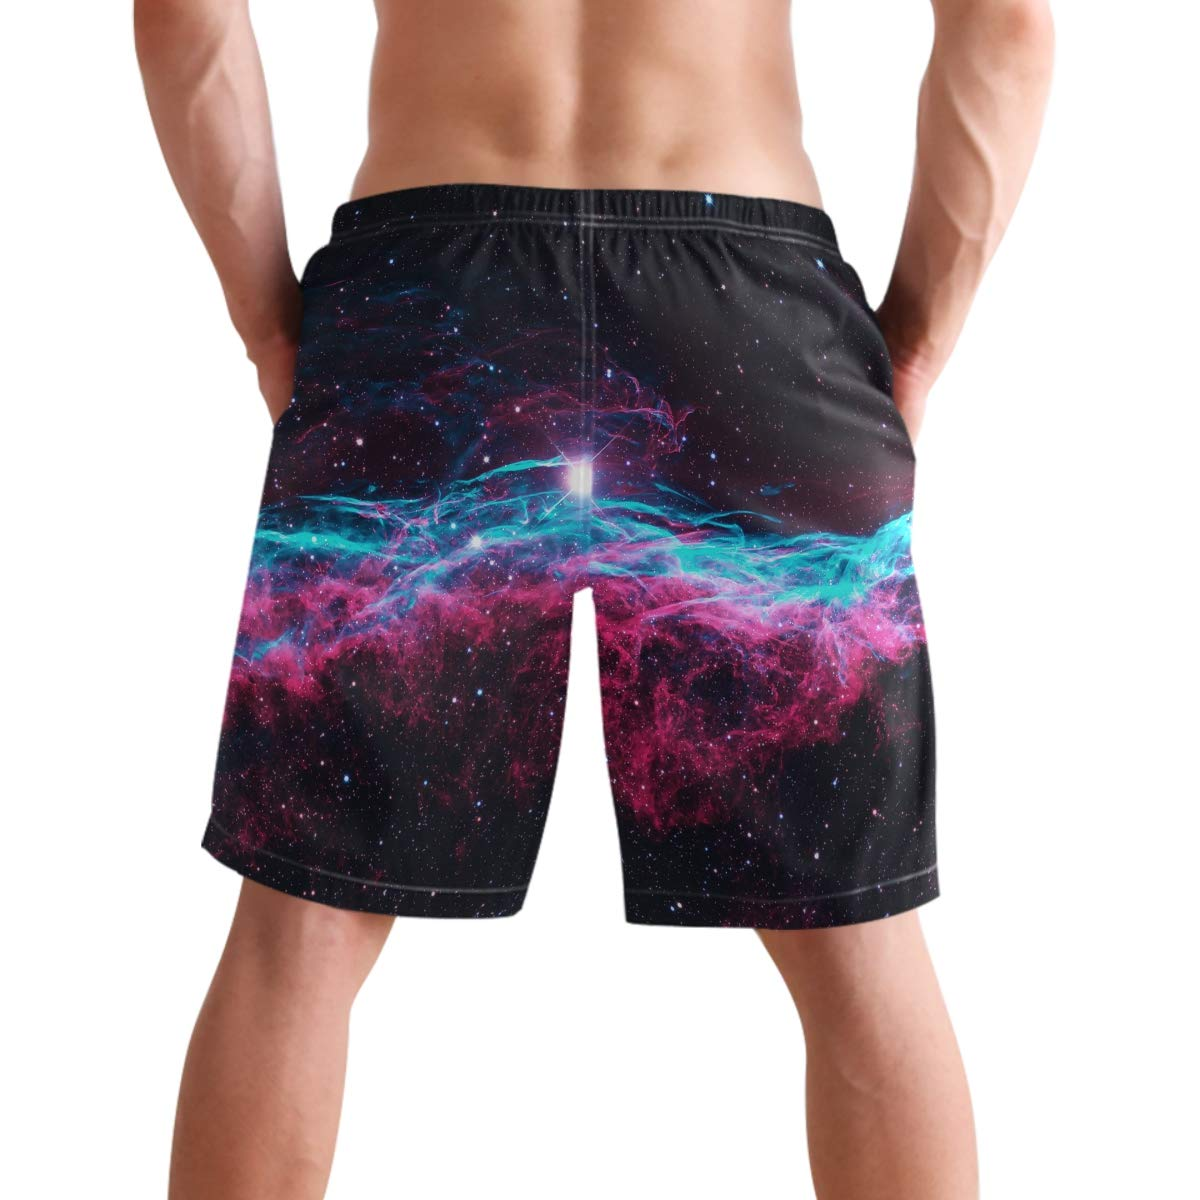 visesunny Magic Galaxy Cloud Mens Beach Shorts Summer Swim Trunks Sports Running Board Shorts with Mesh Lining